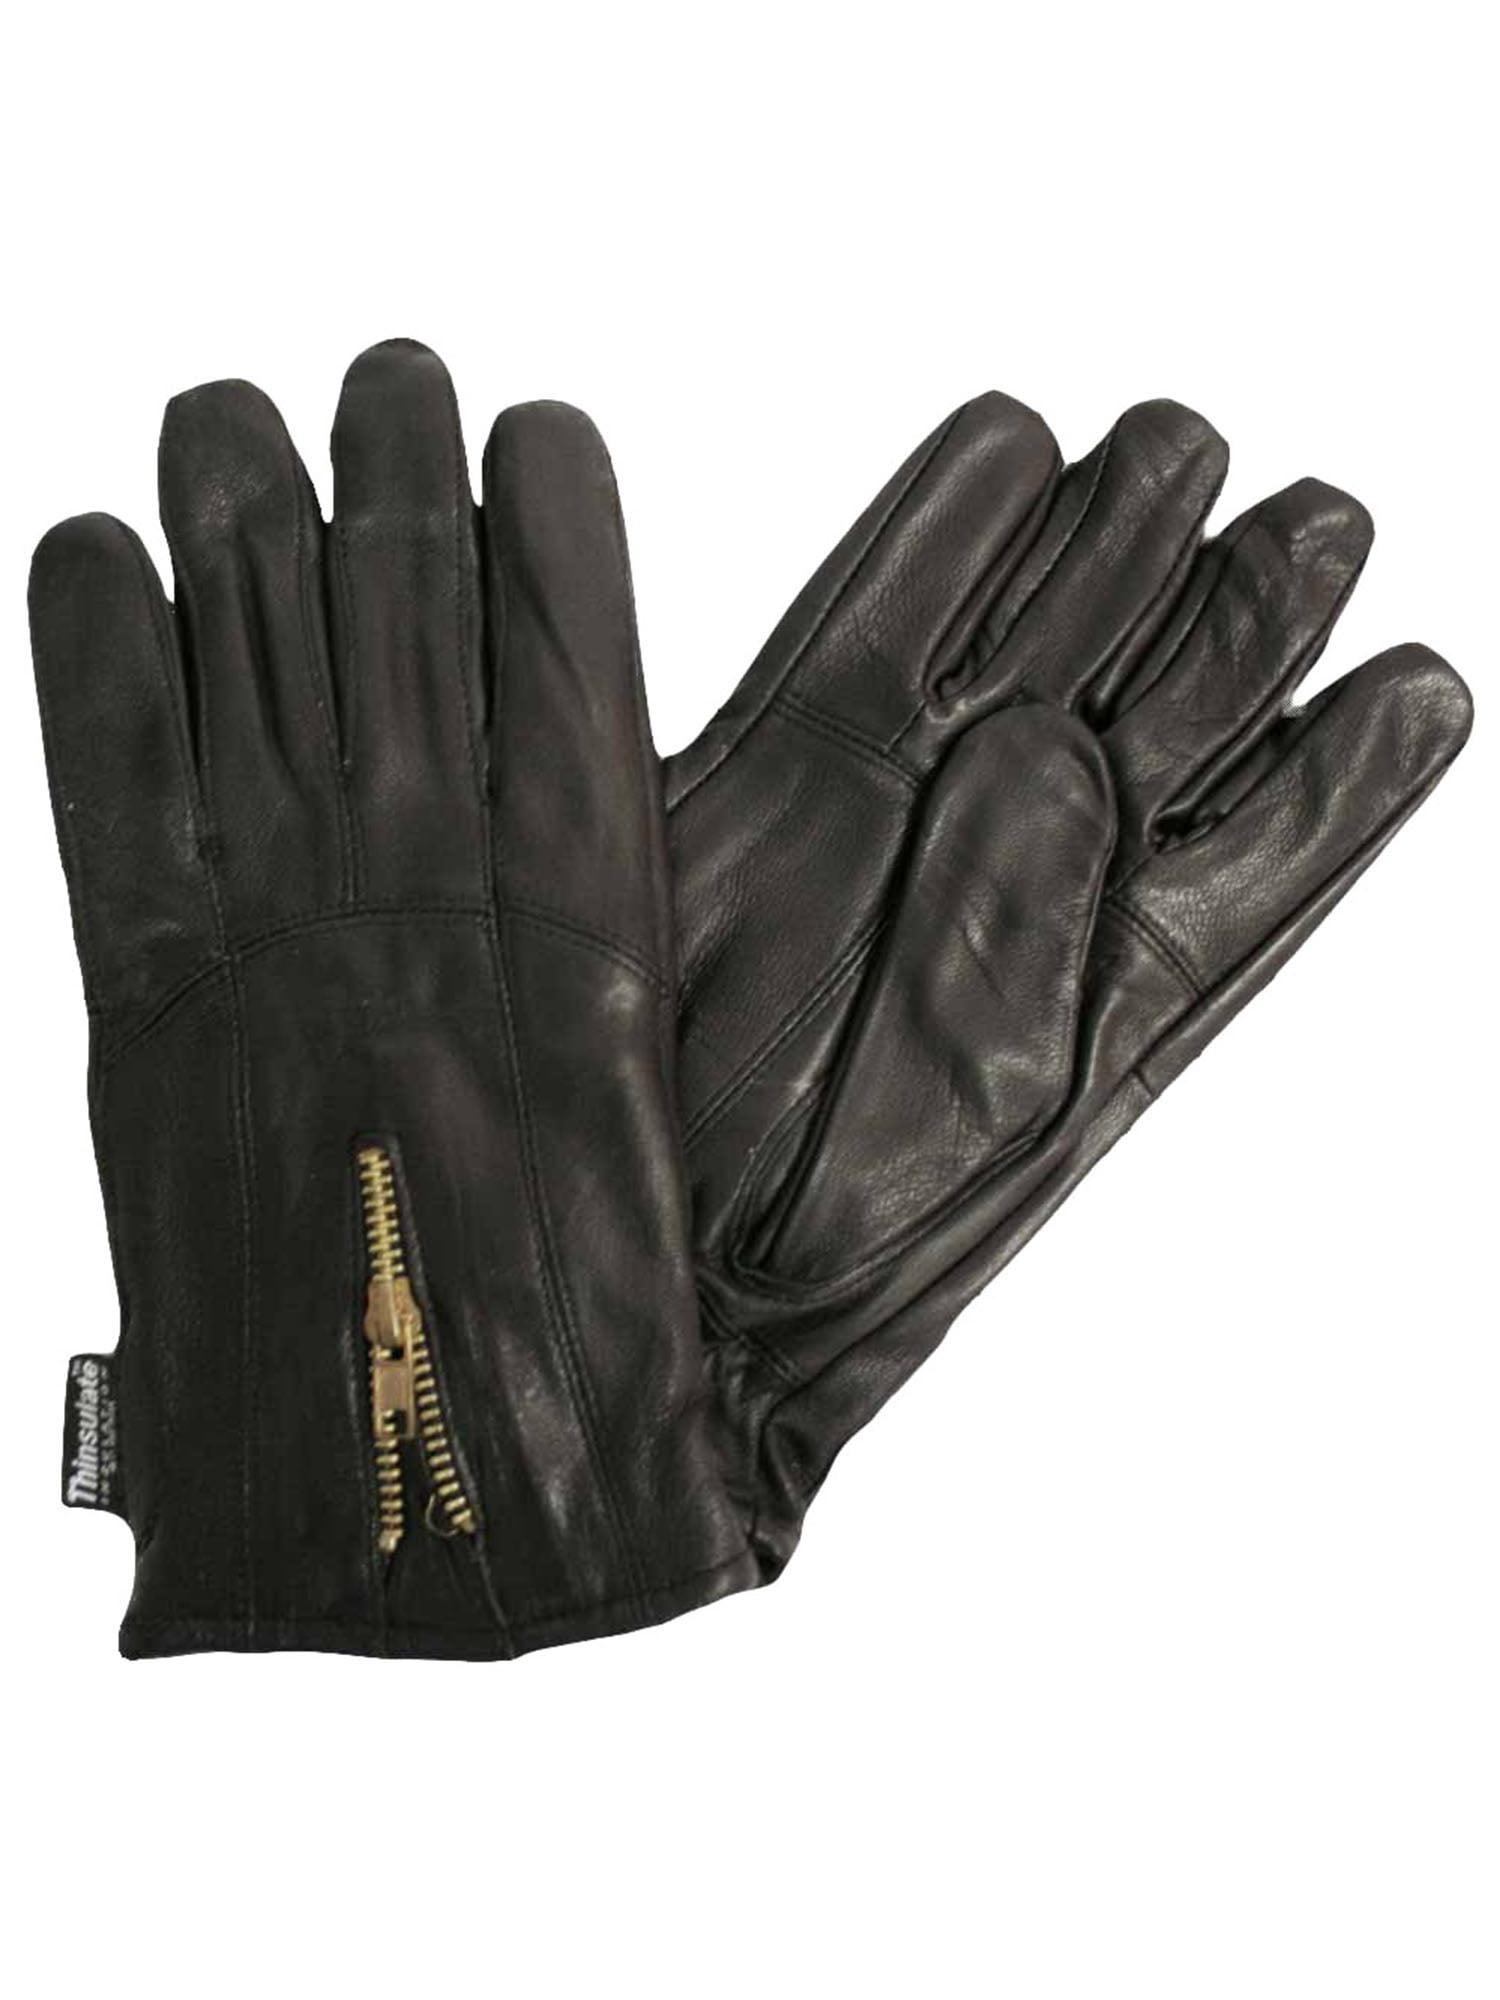 Men/'s Winter 3M Thinsulate Lined Soft Genuine Leather Zipper Wrist Gloves Black